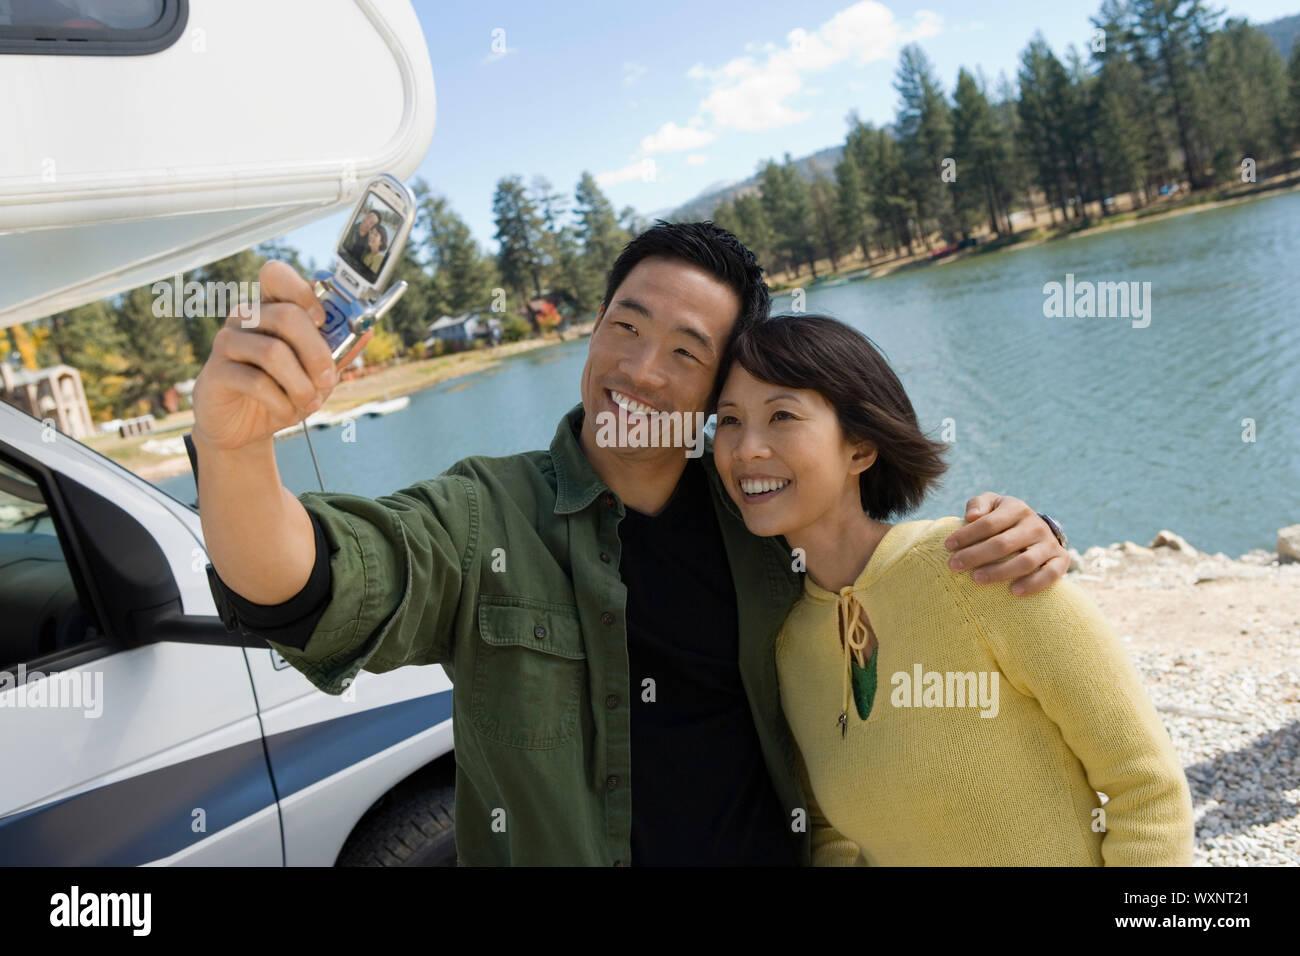 Couple Using Cell Phone Camera at Lake Stock Photo